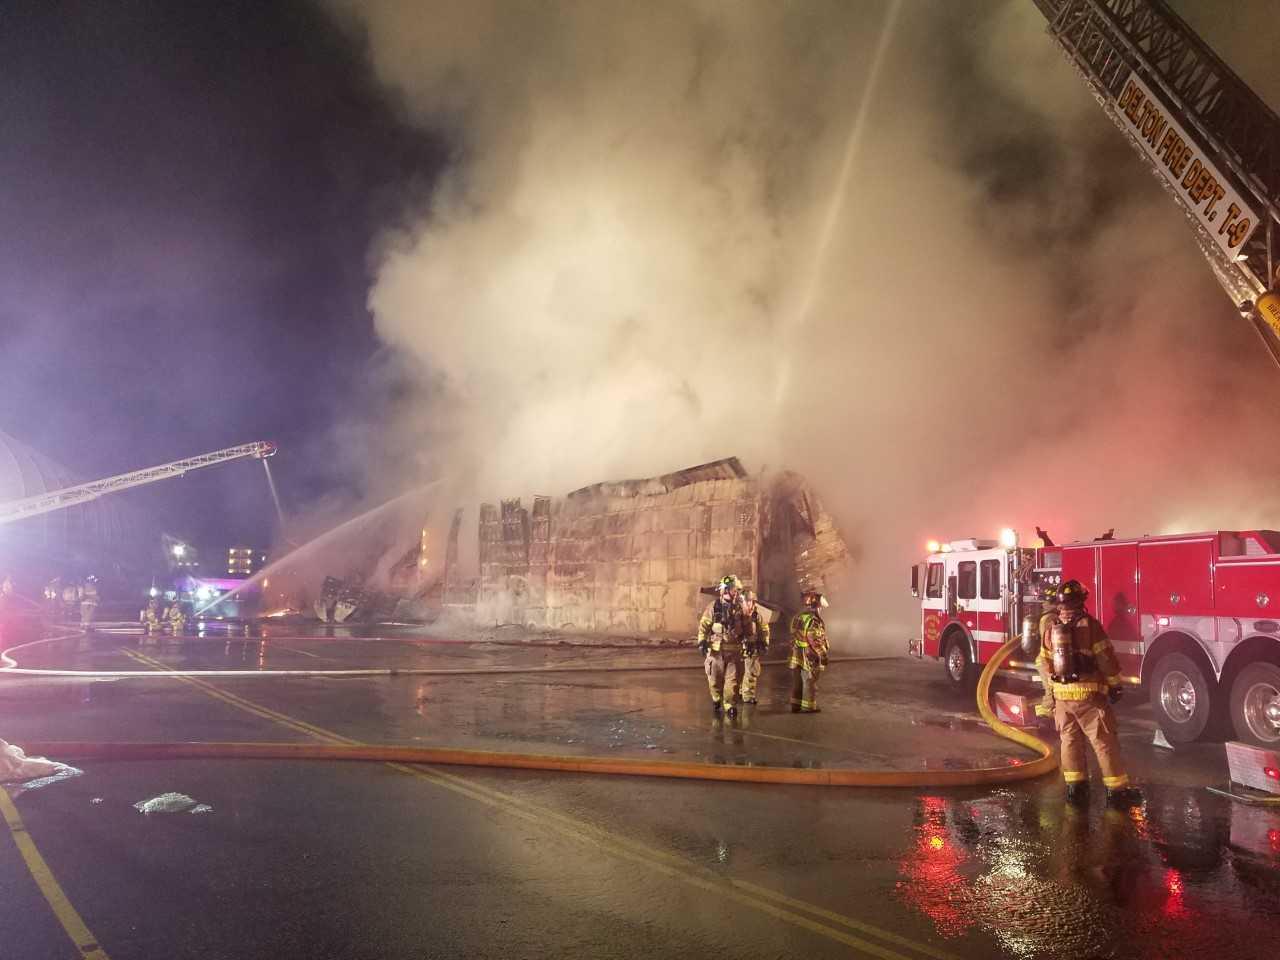 Courtesy: Delton Fire Department